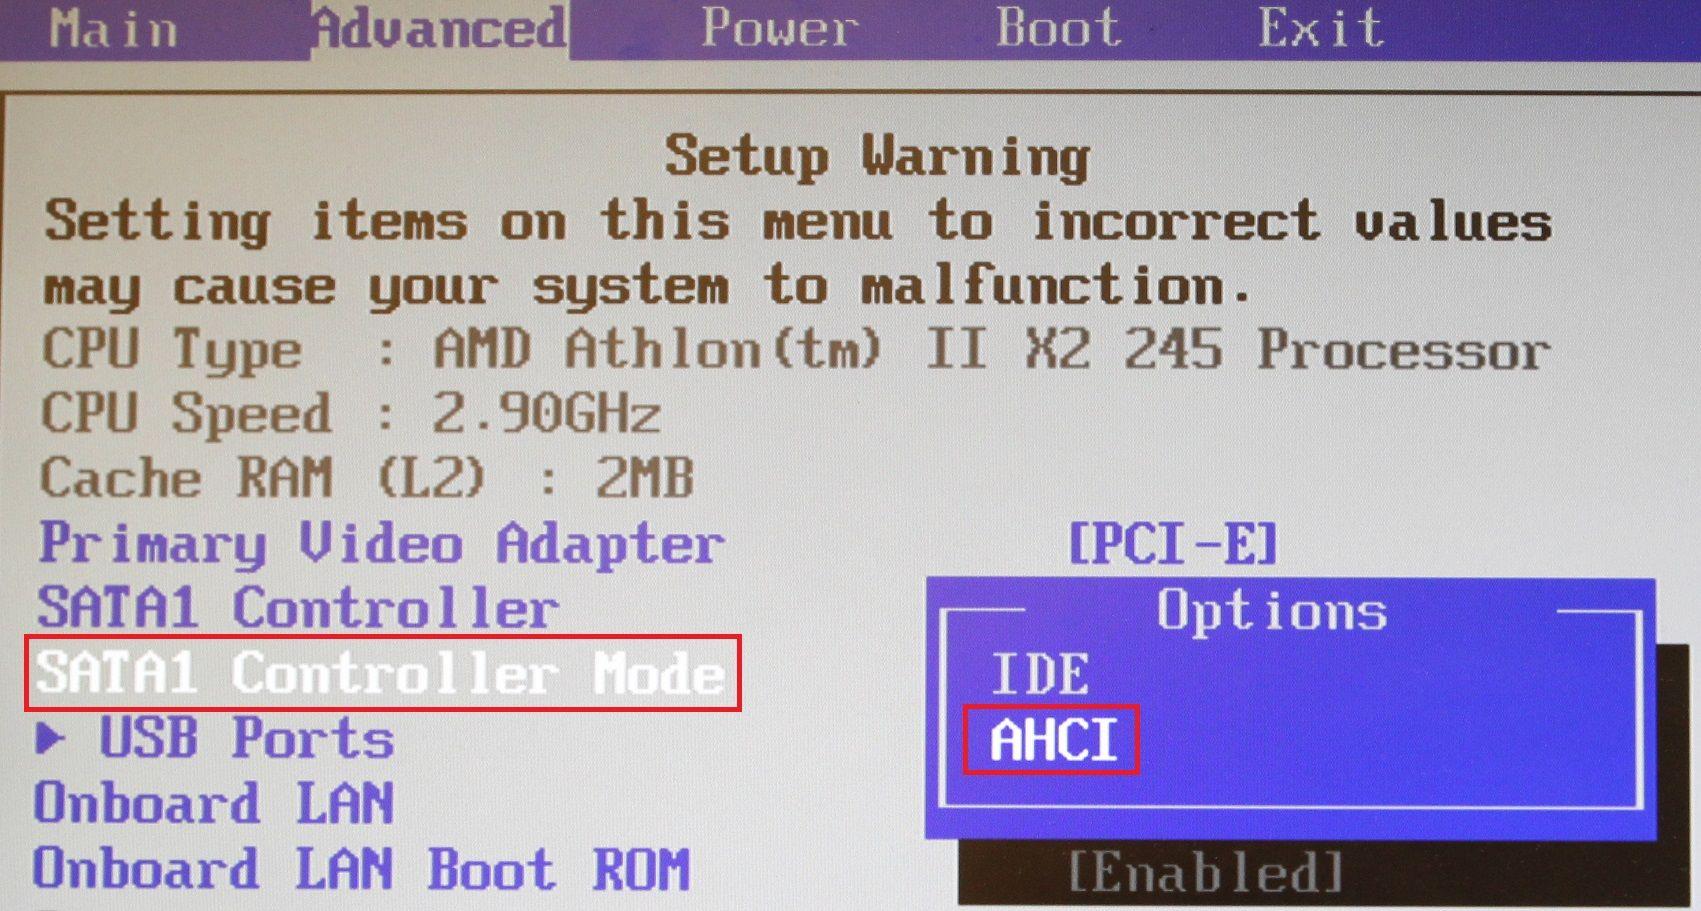 Har du en SSD, bør denne settes i AHCI-modus.